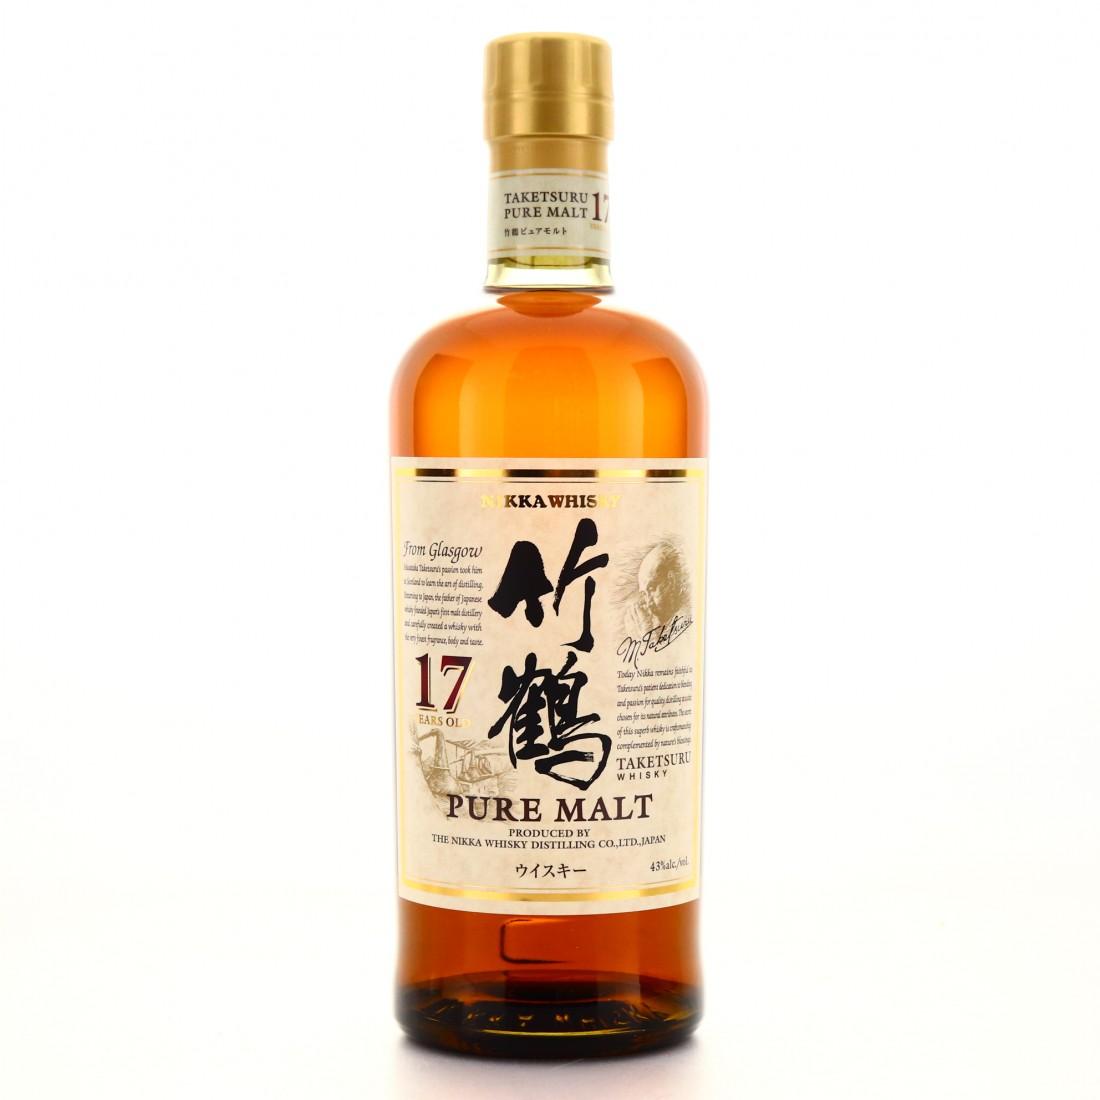 Taketsuru 17 Year Old Pure Malt